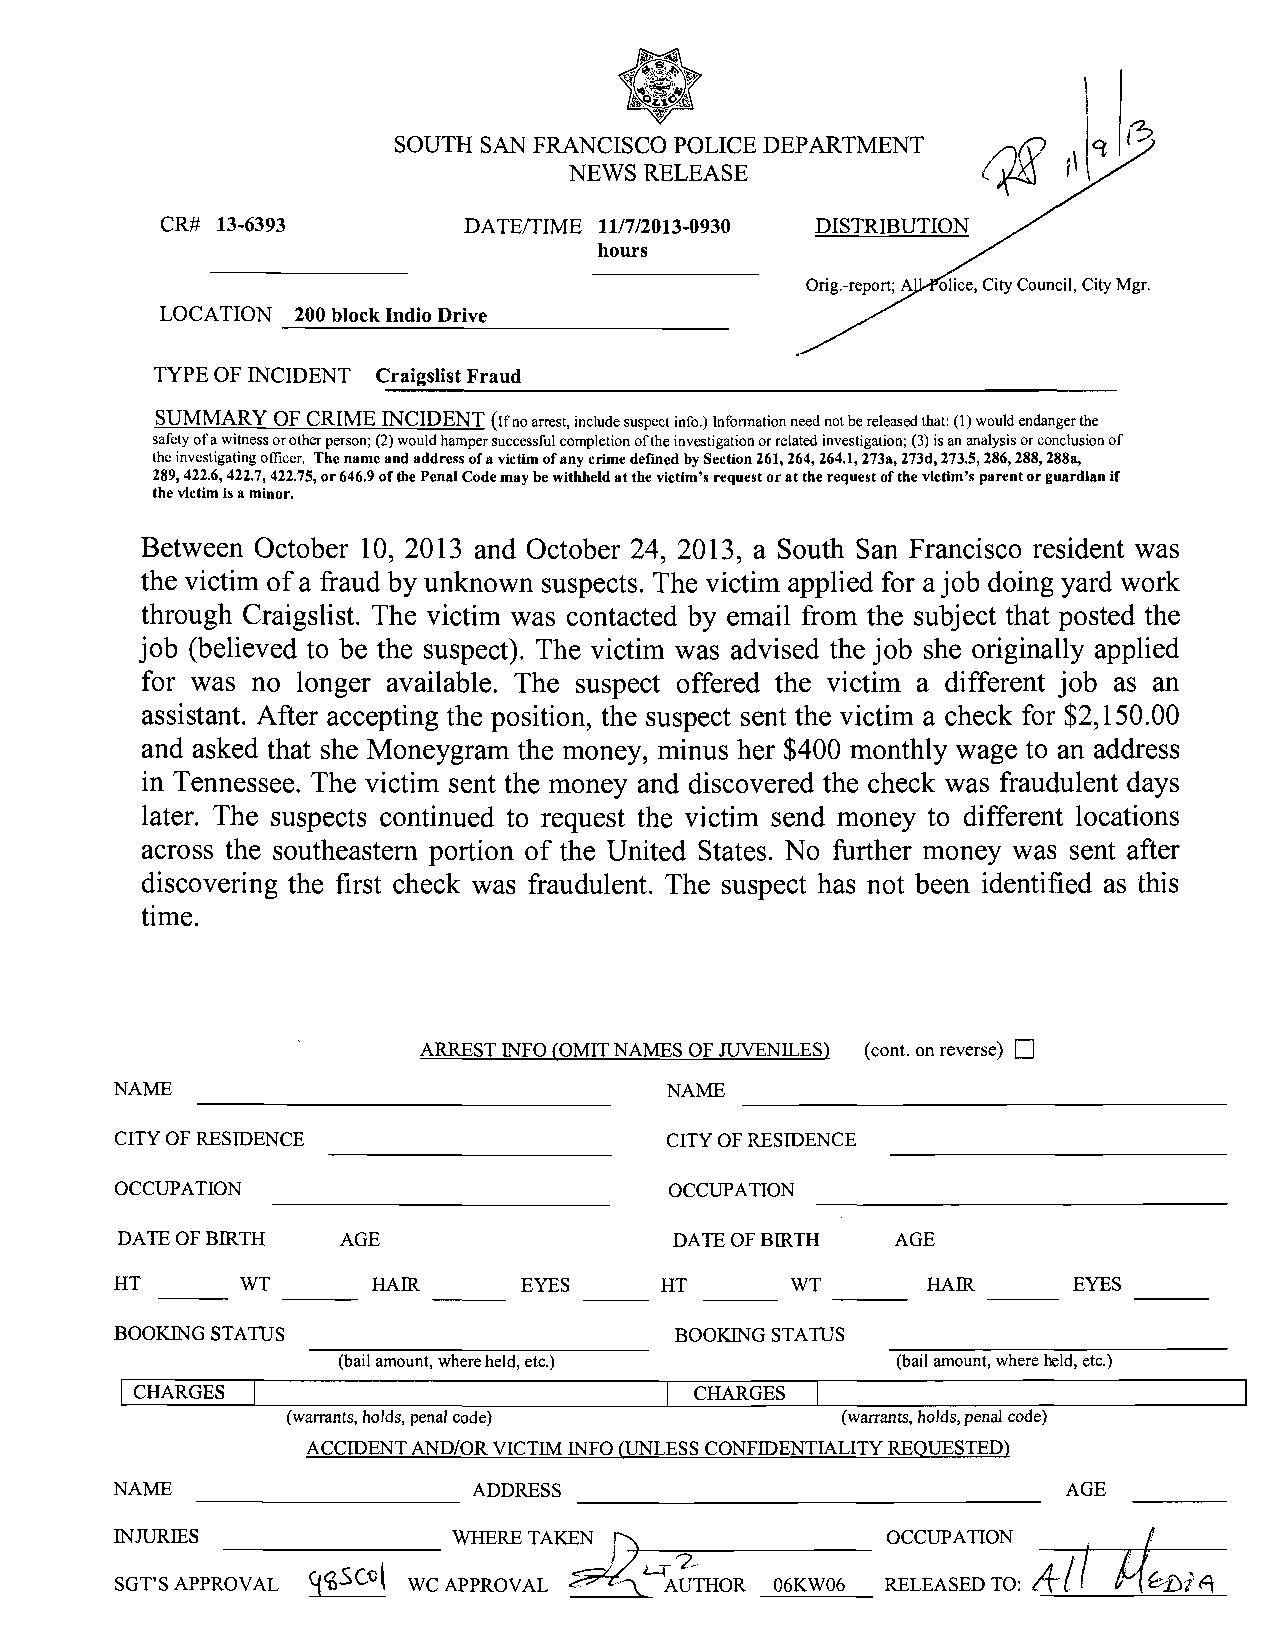 SSFPD 11.7.2013 Craiglist fraud-page-001